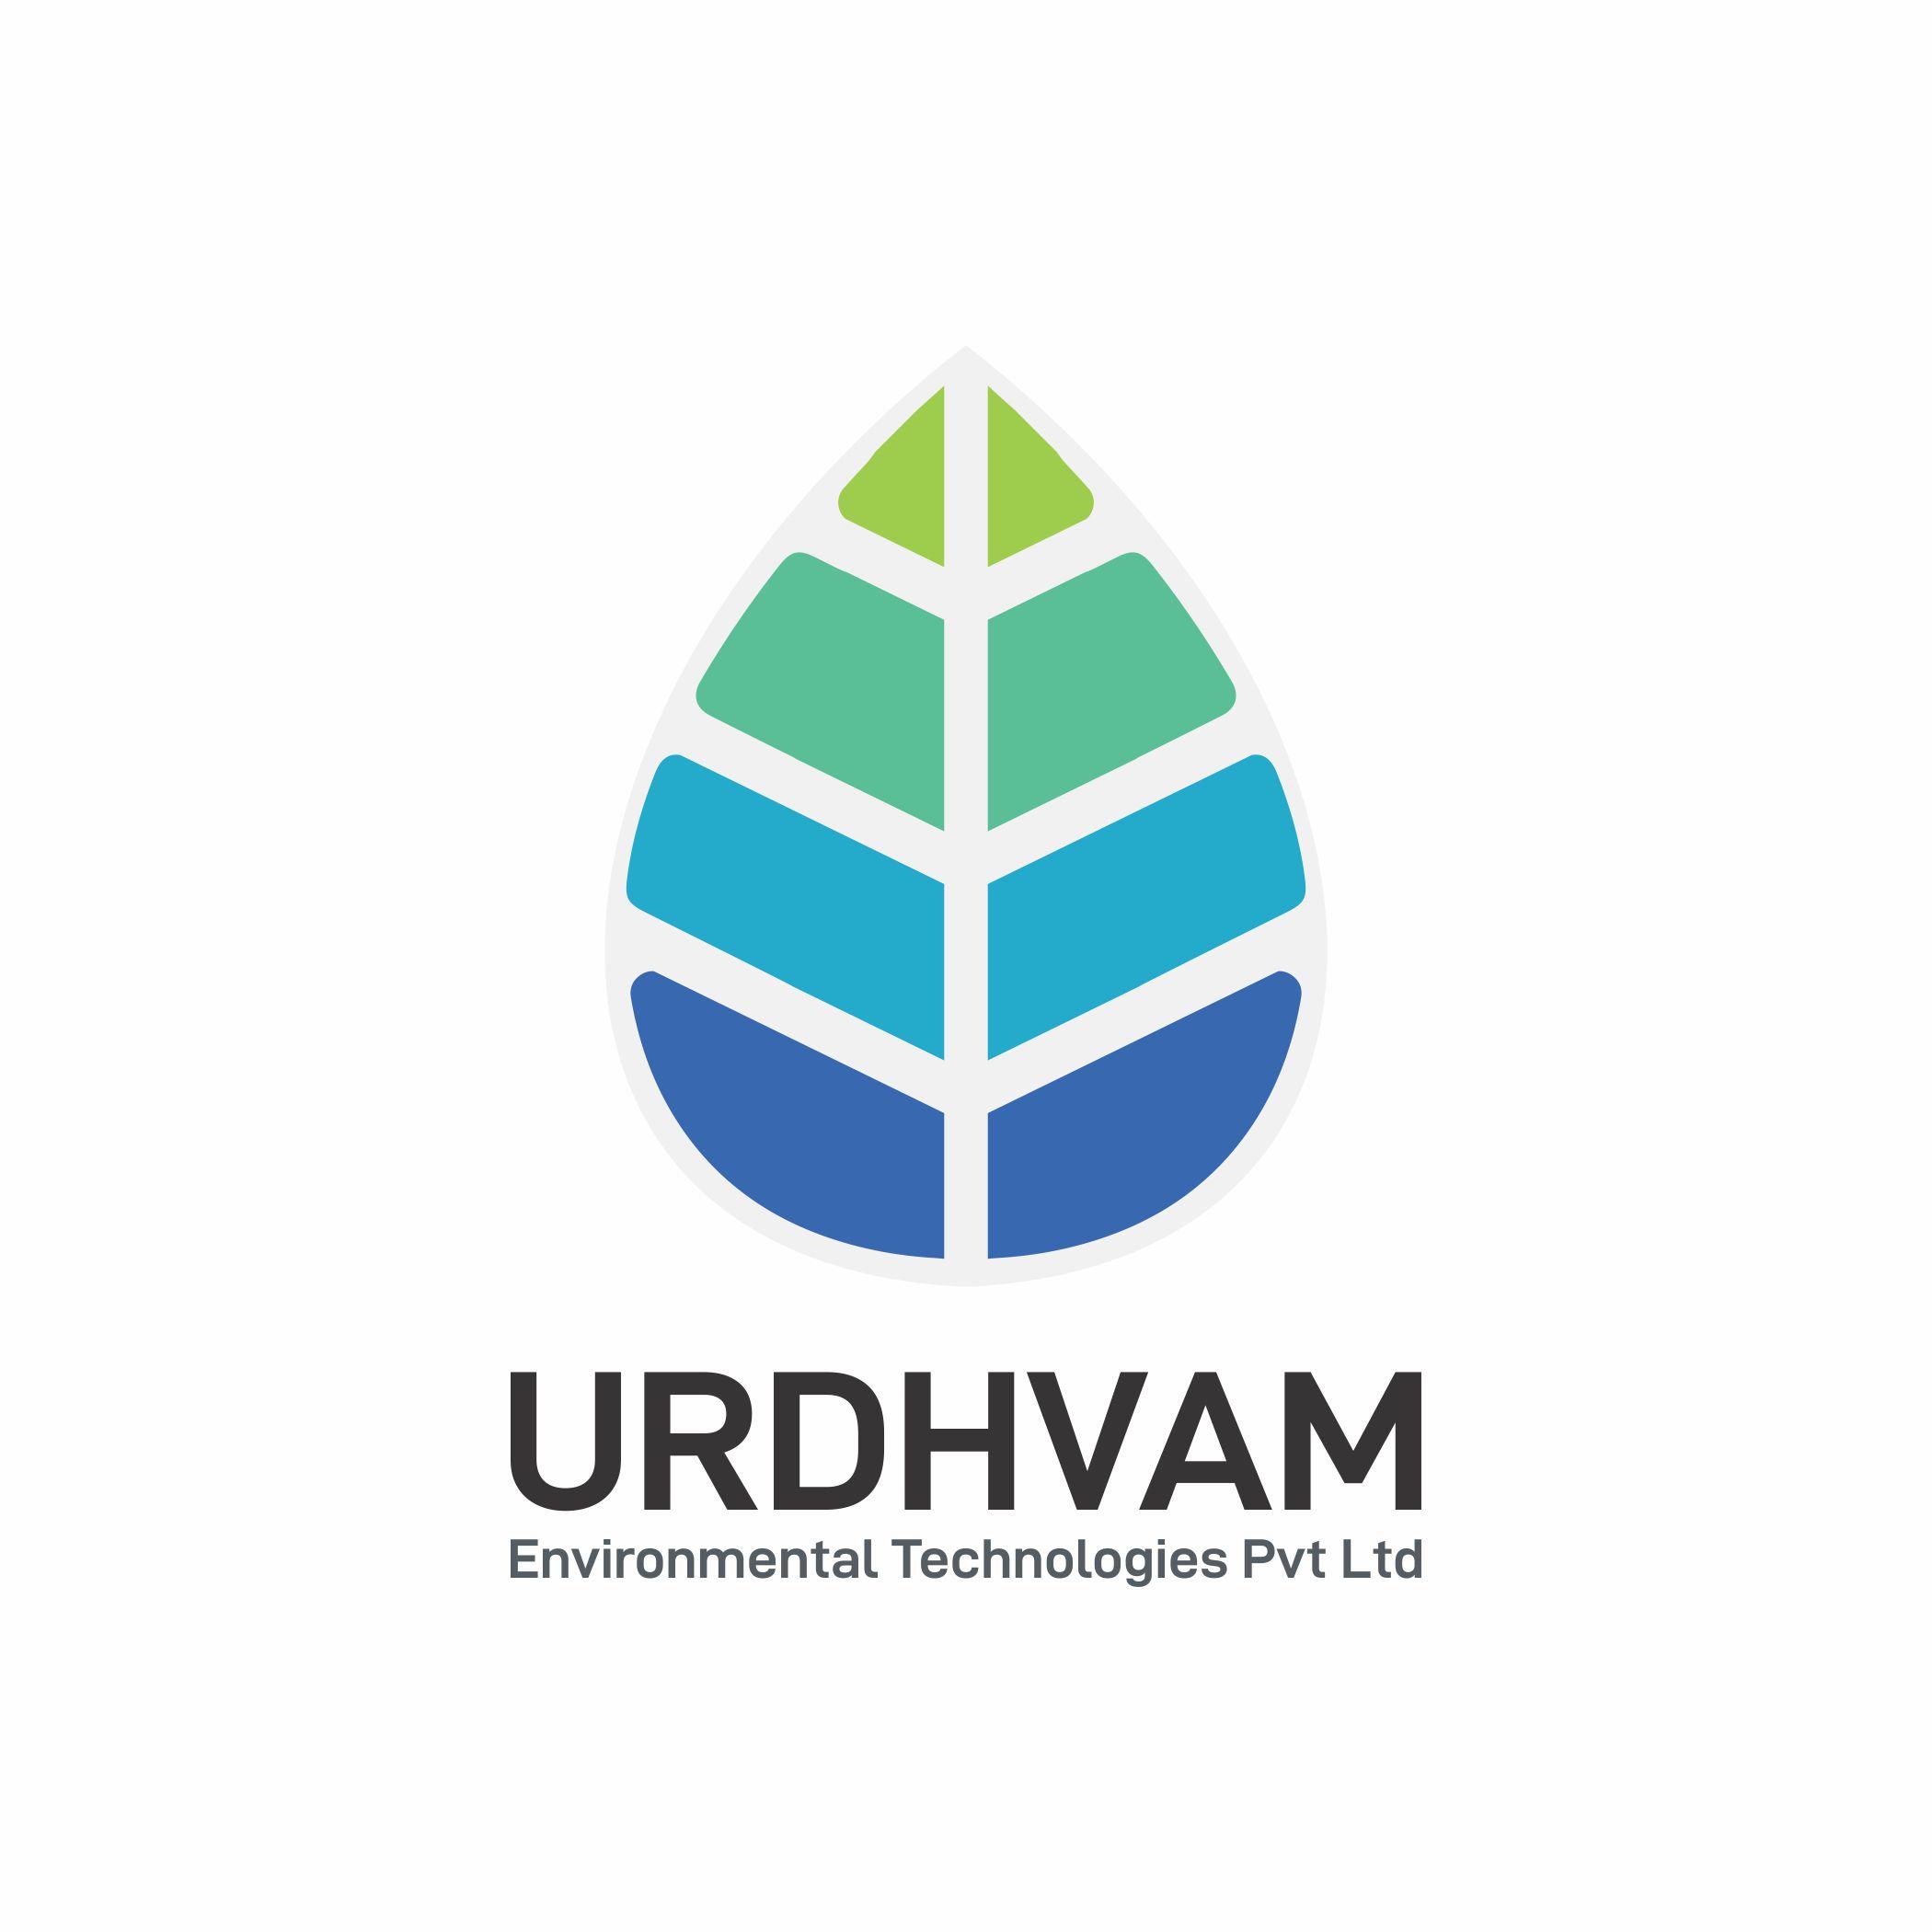 Urdhvam Environmental Technologies Pvt. Ltd.